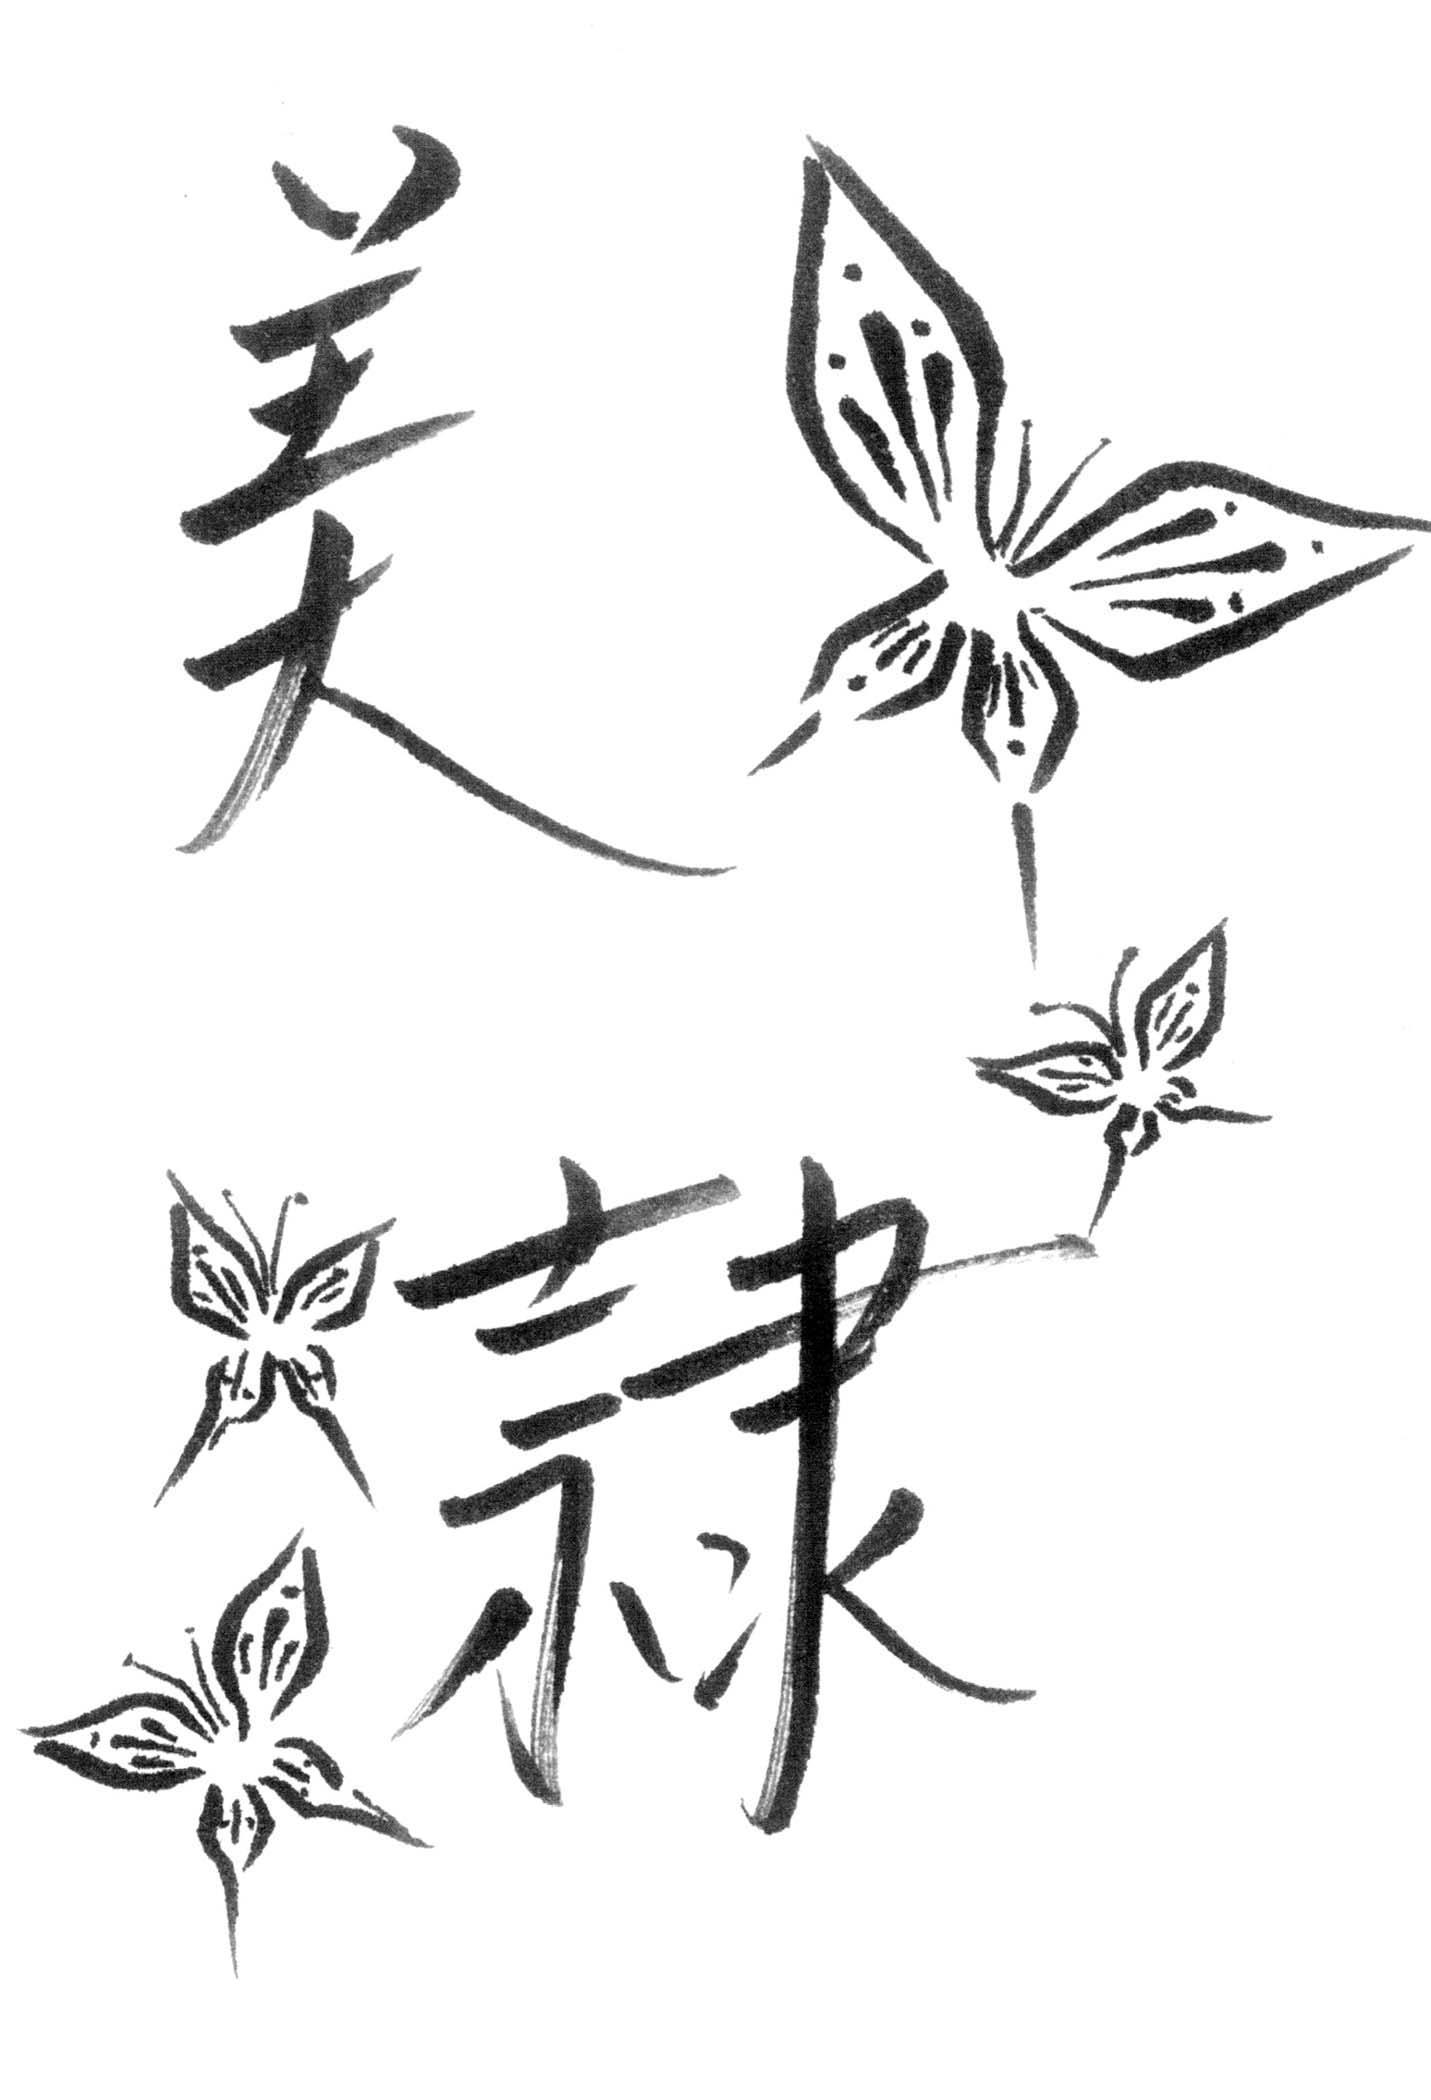 Kanji Tattoo Design By Avez F On Deviantart